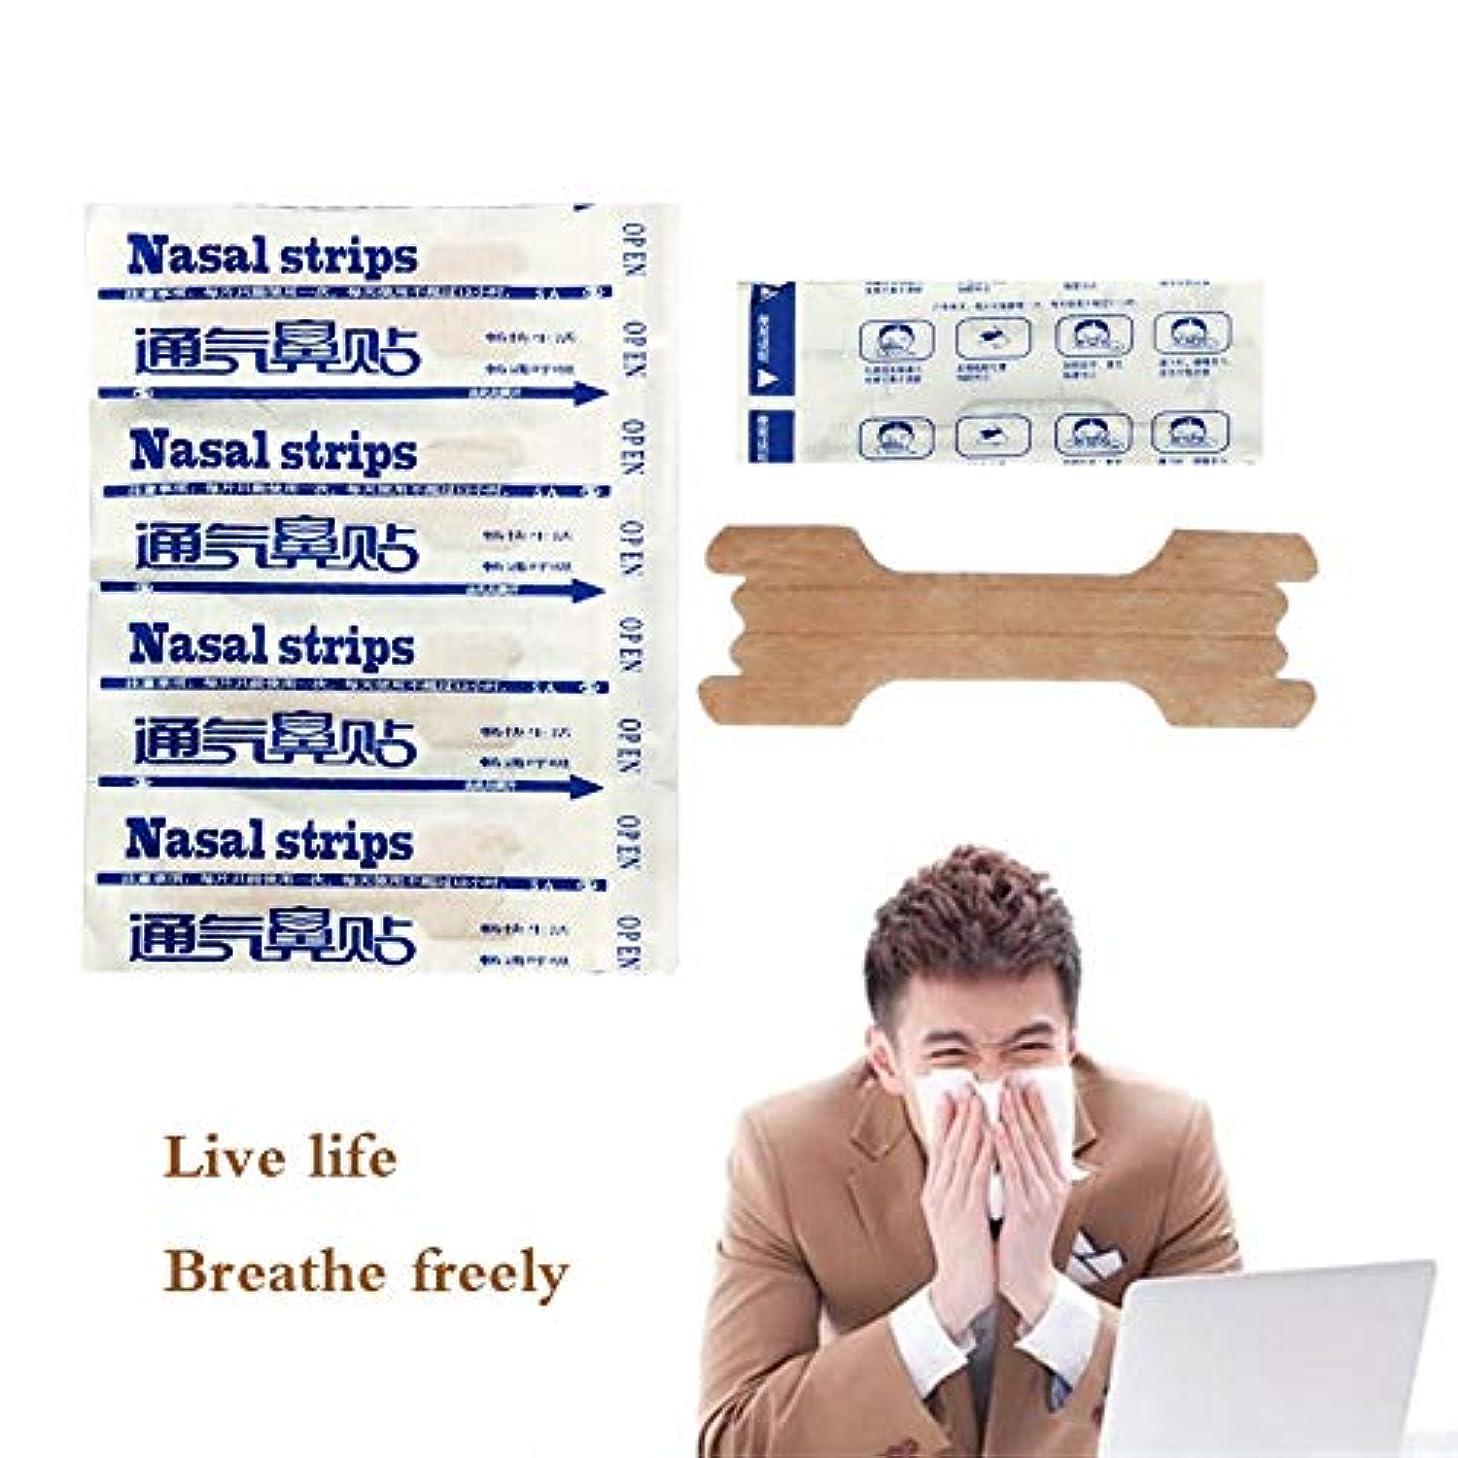 NOTE 50個の呼吸の良い鼻のストリップ正しいいびきを防止する正しい方法鼻のストリップ簡単な呼吸のヘルスケア